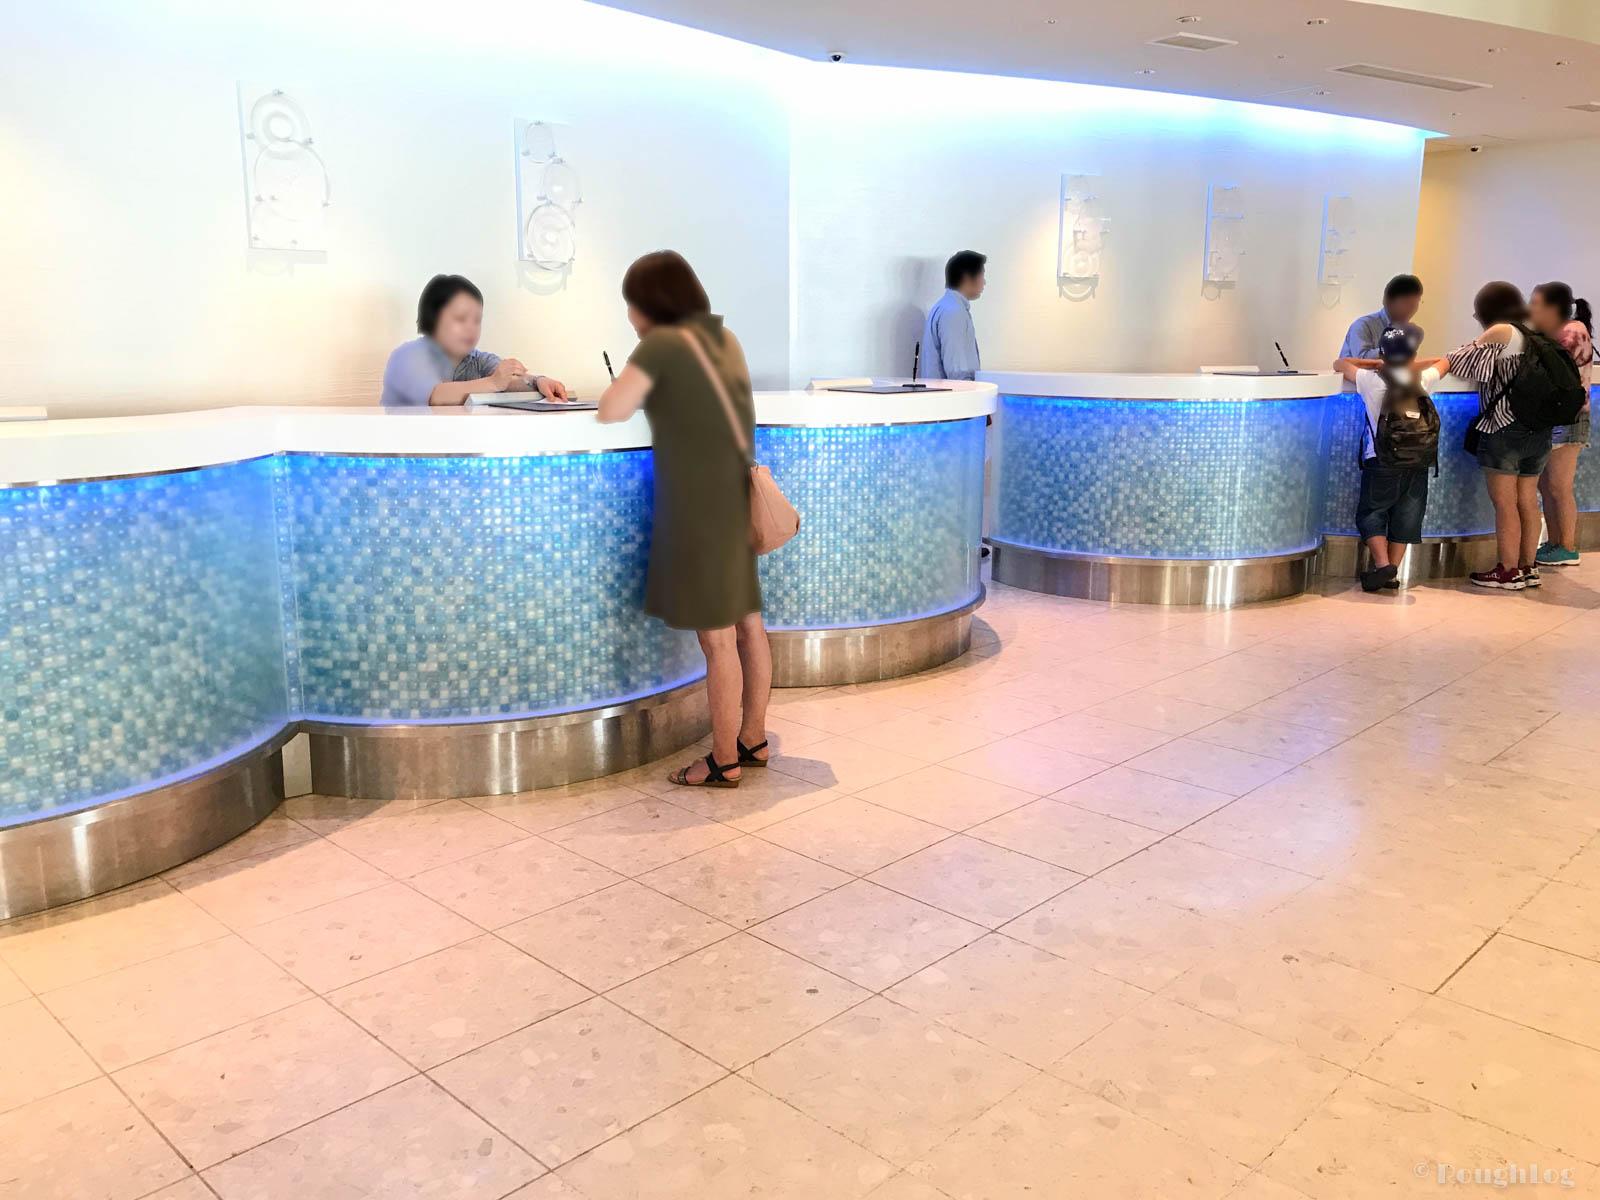 ANAインターコンチネンタル万座ビーチリゾートのホテルフロント